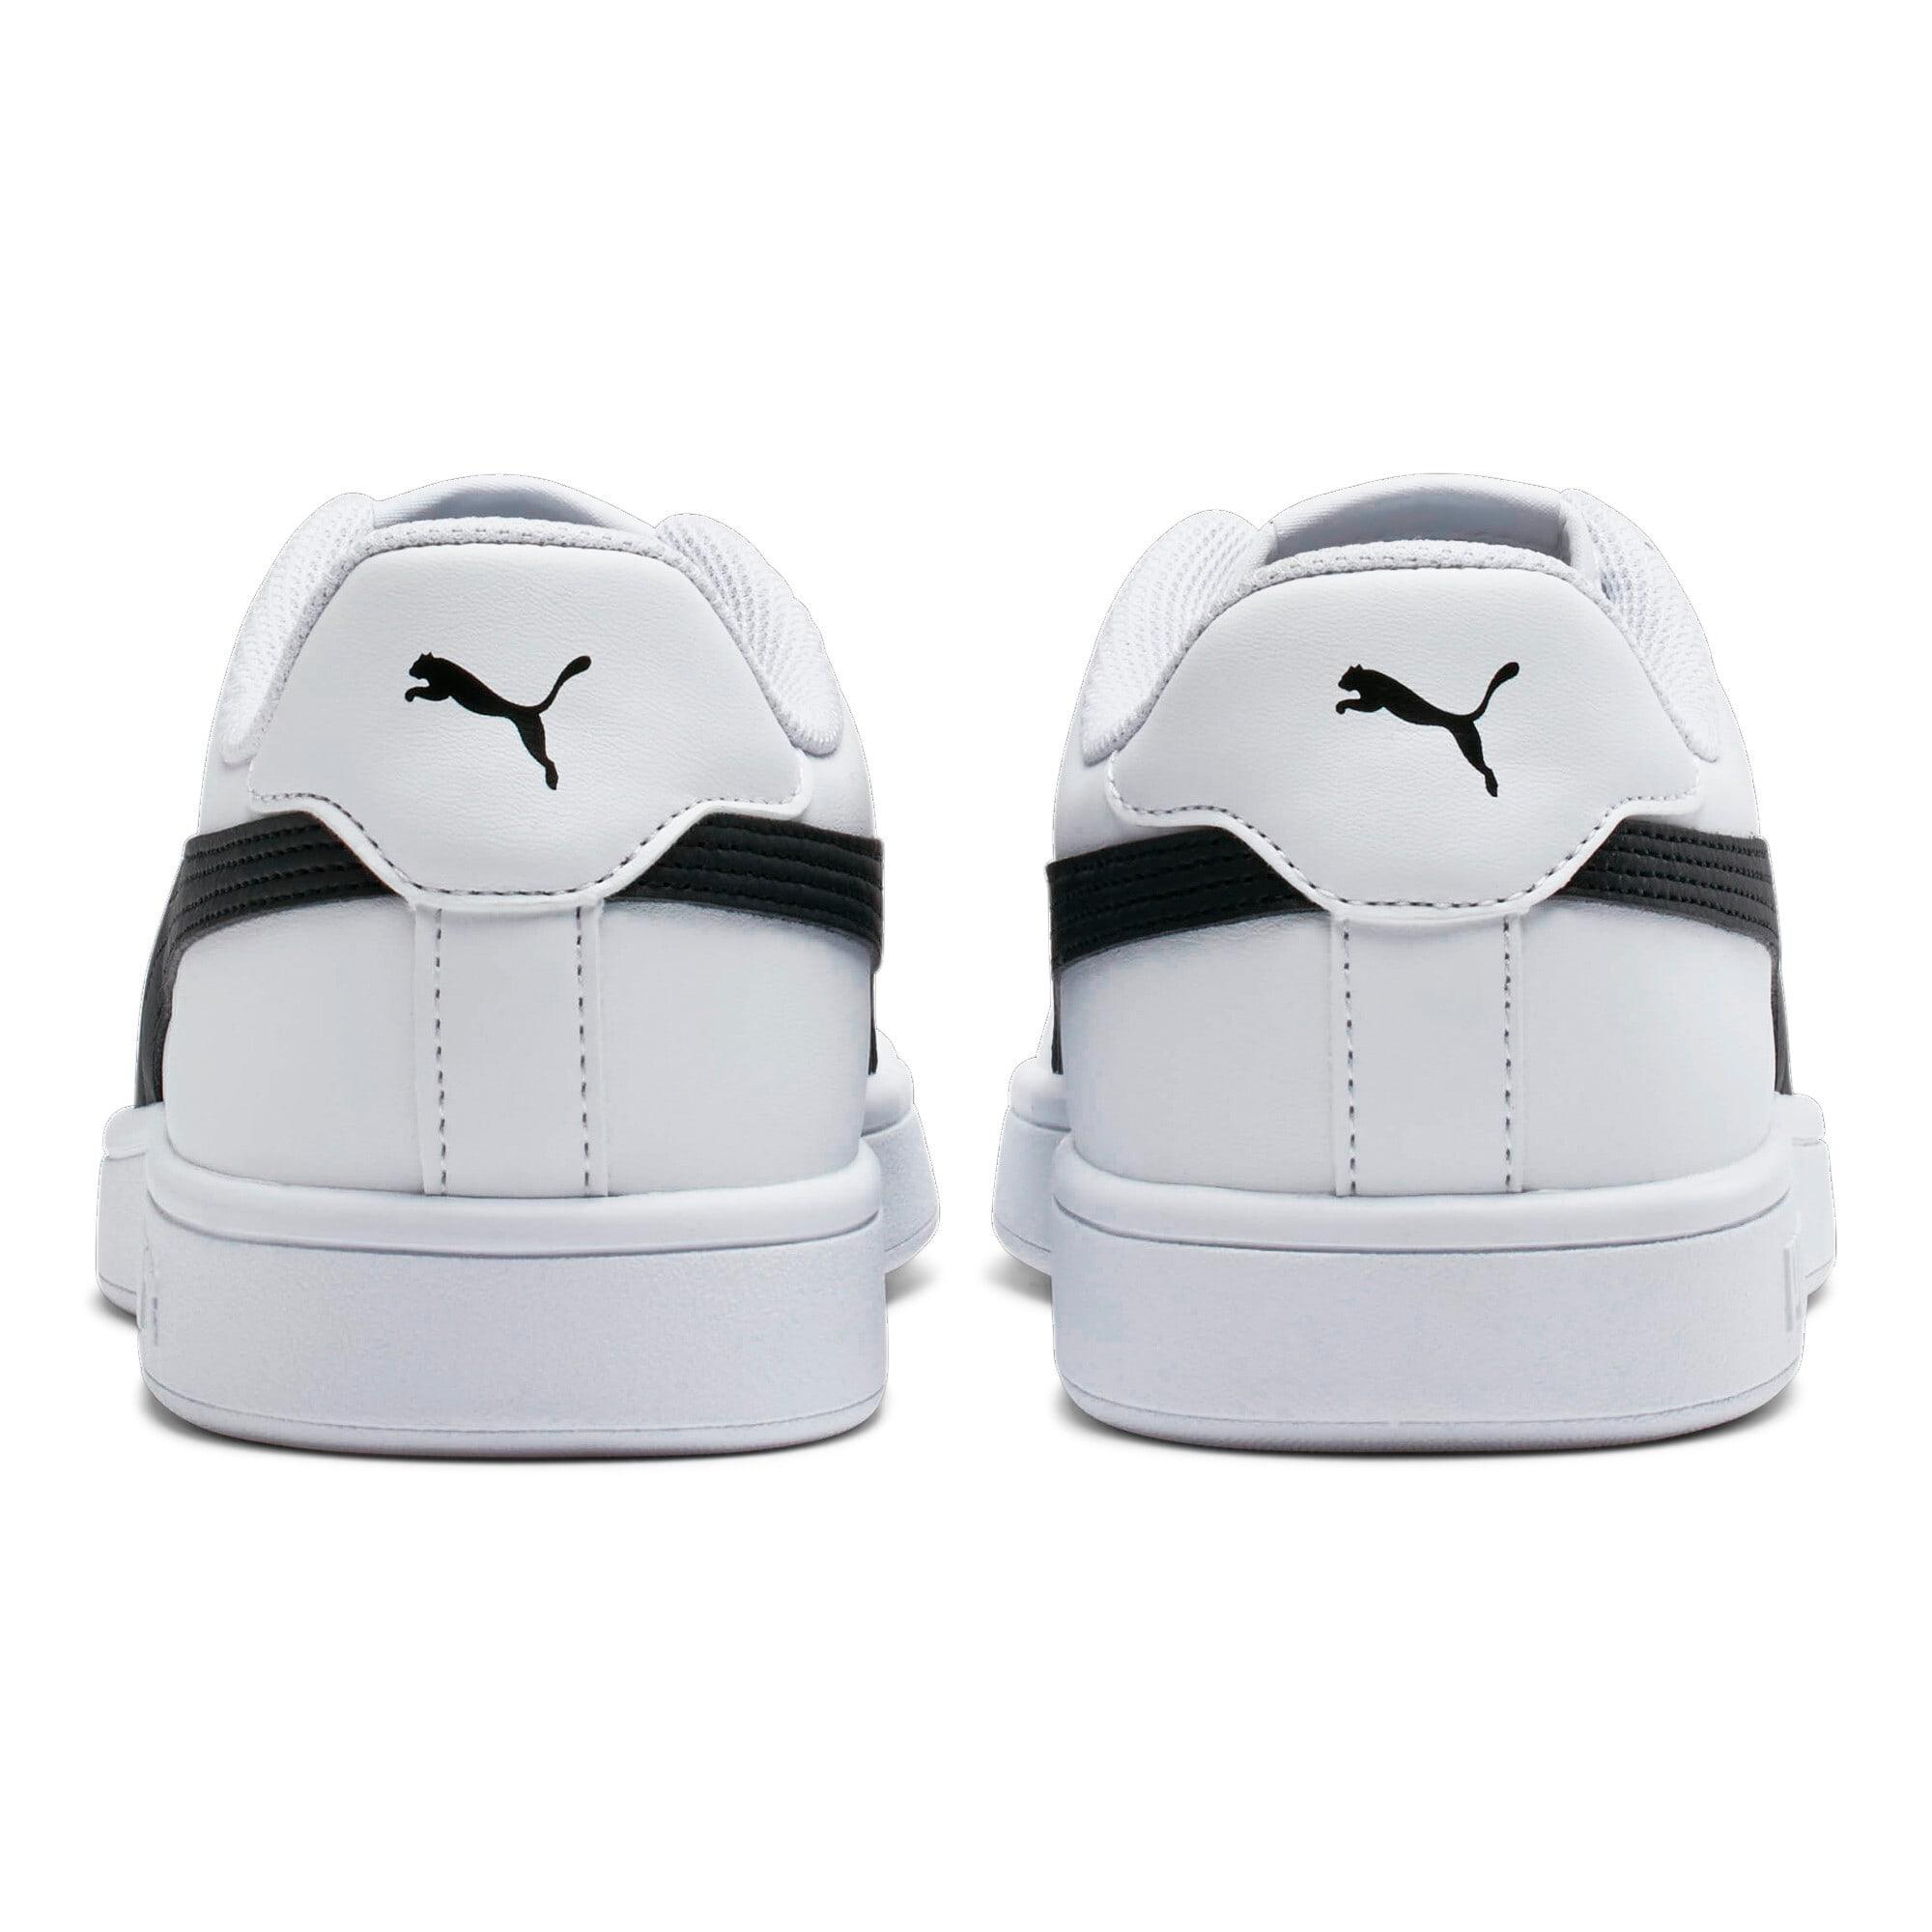 Thumbnail 4 of Smash v2 Leather Sneakers, Puma White-Puma Black, medium